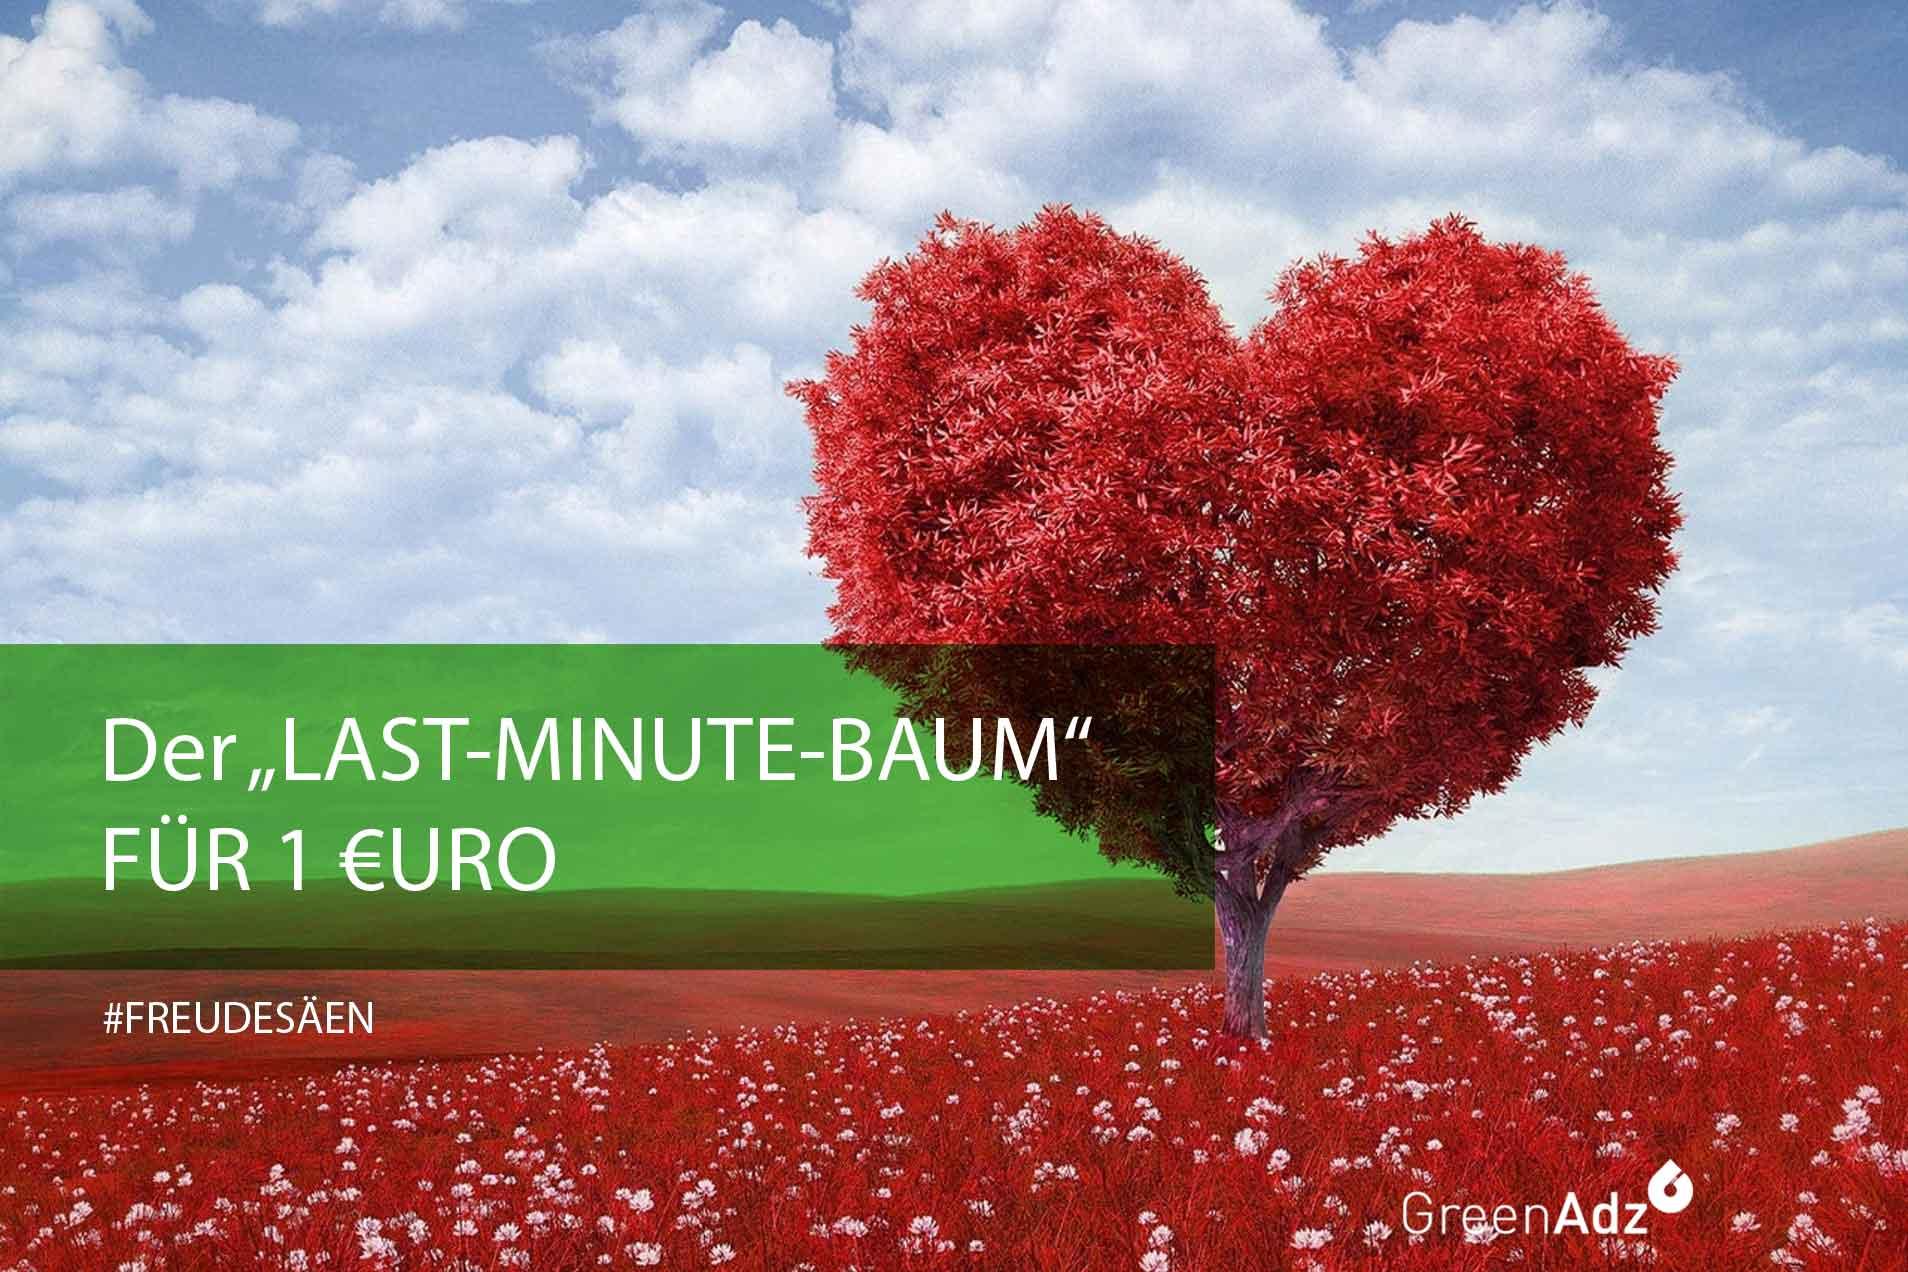 #MehrFreudeanMafo #LastMinuteBaum #Freudesäen